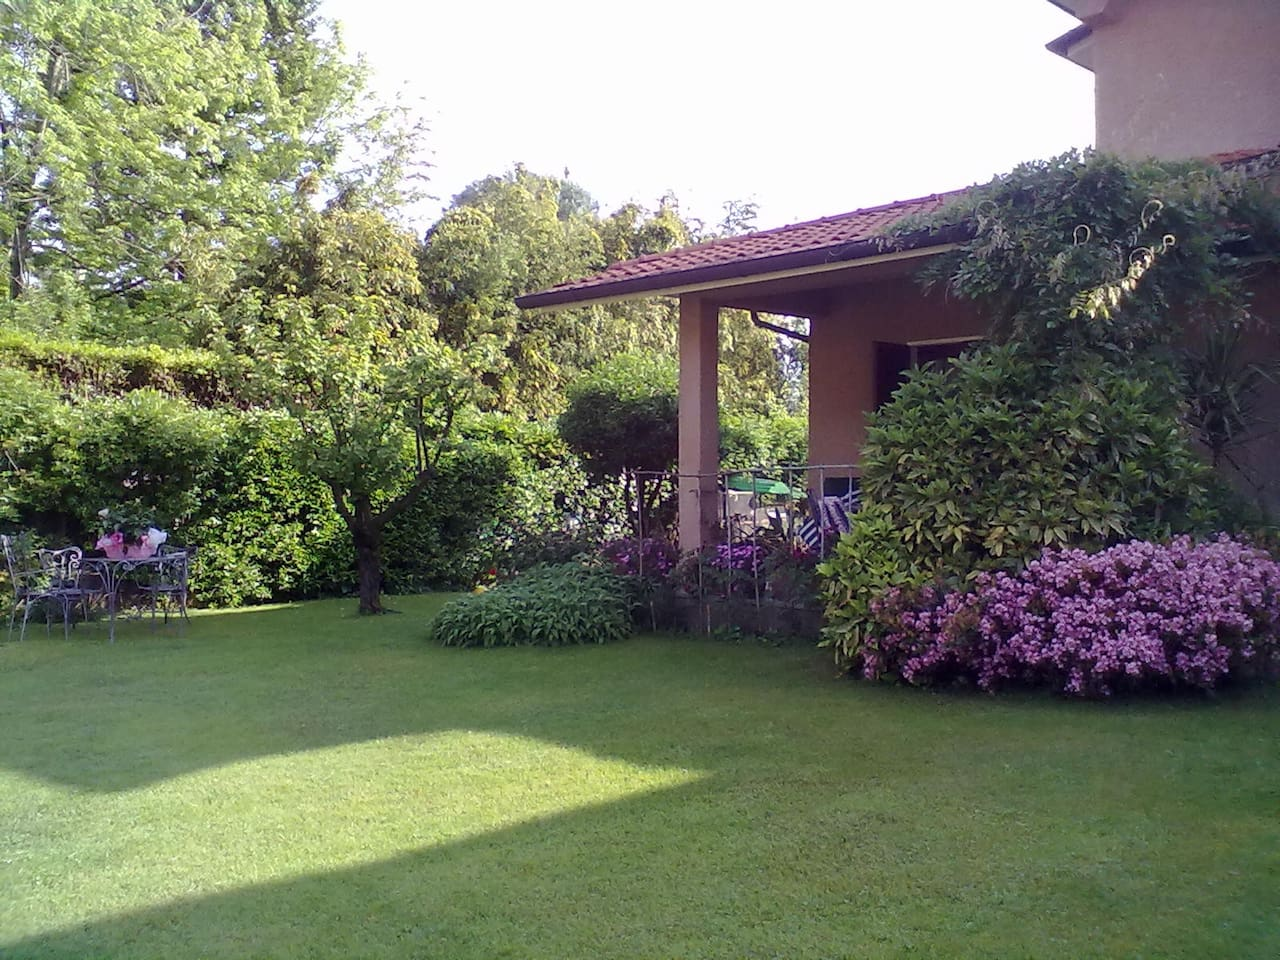 un giardino incantato